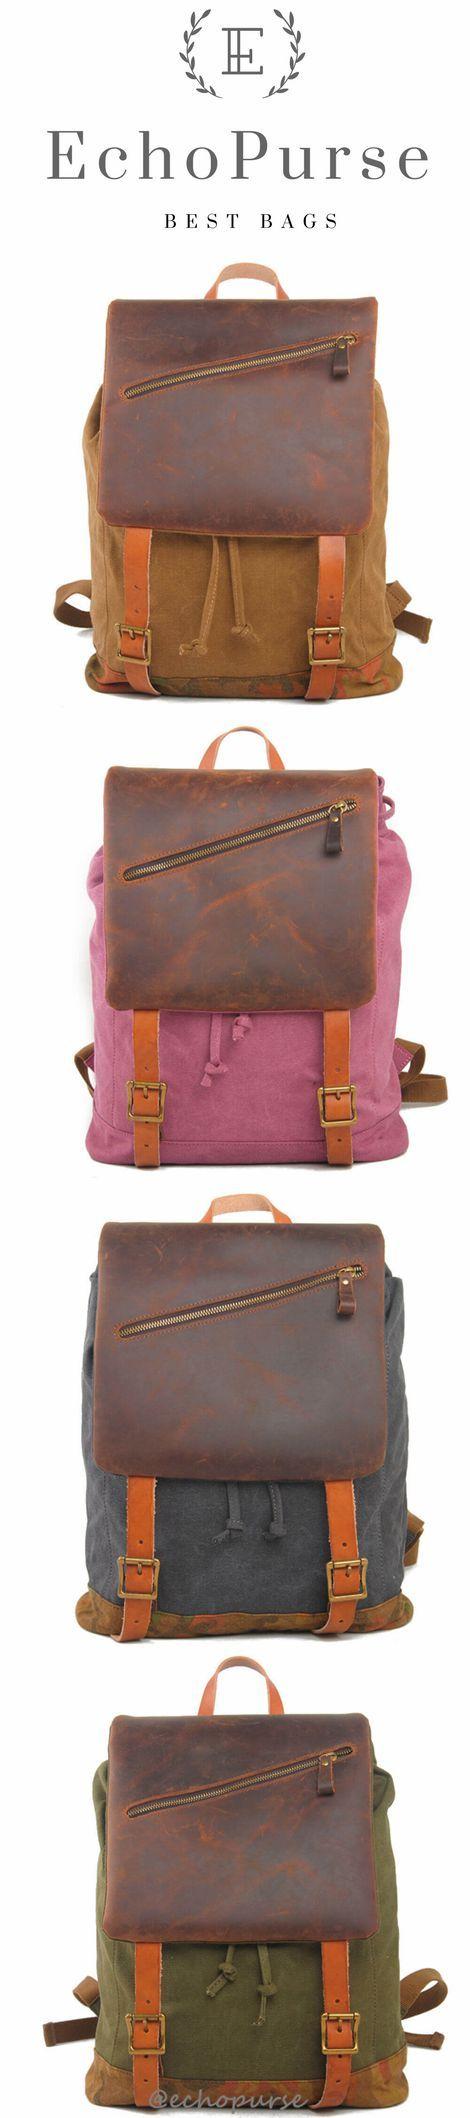 Vintage Rucksack Bag, Canvas And Leather Khaki School Backpack 1978